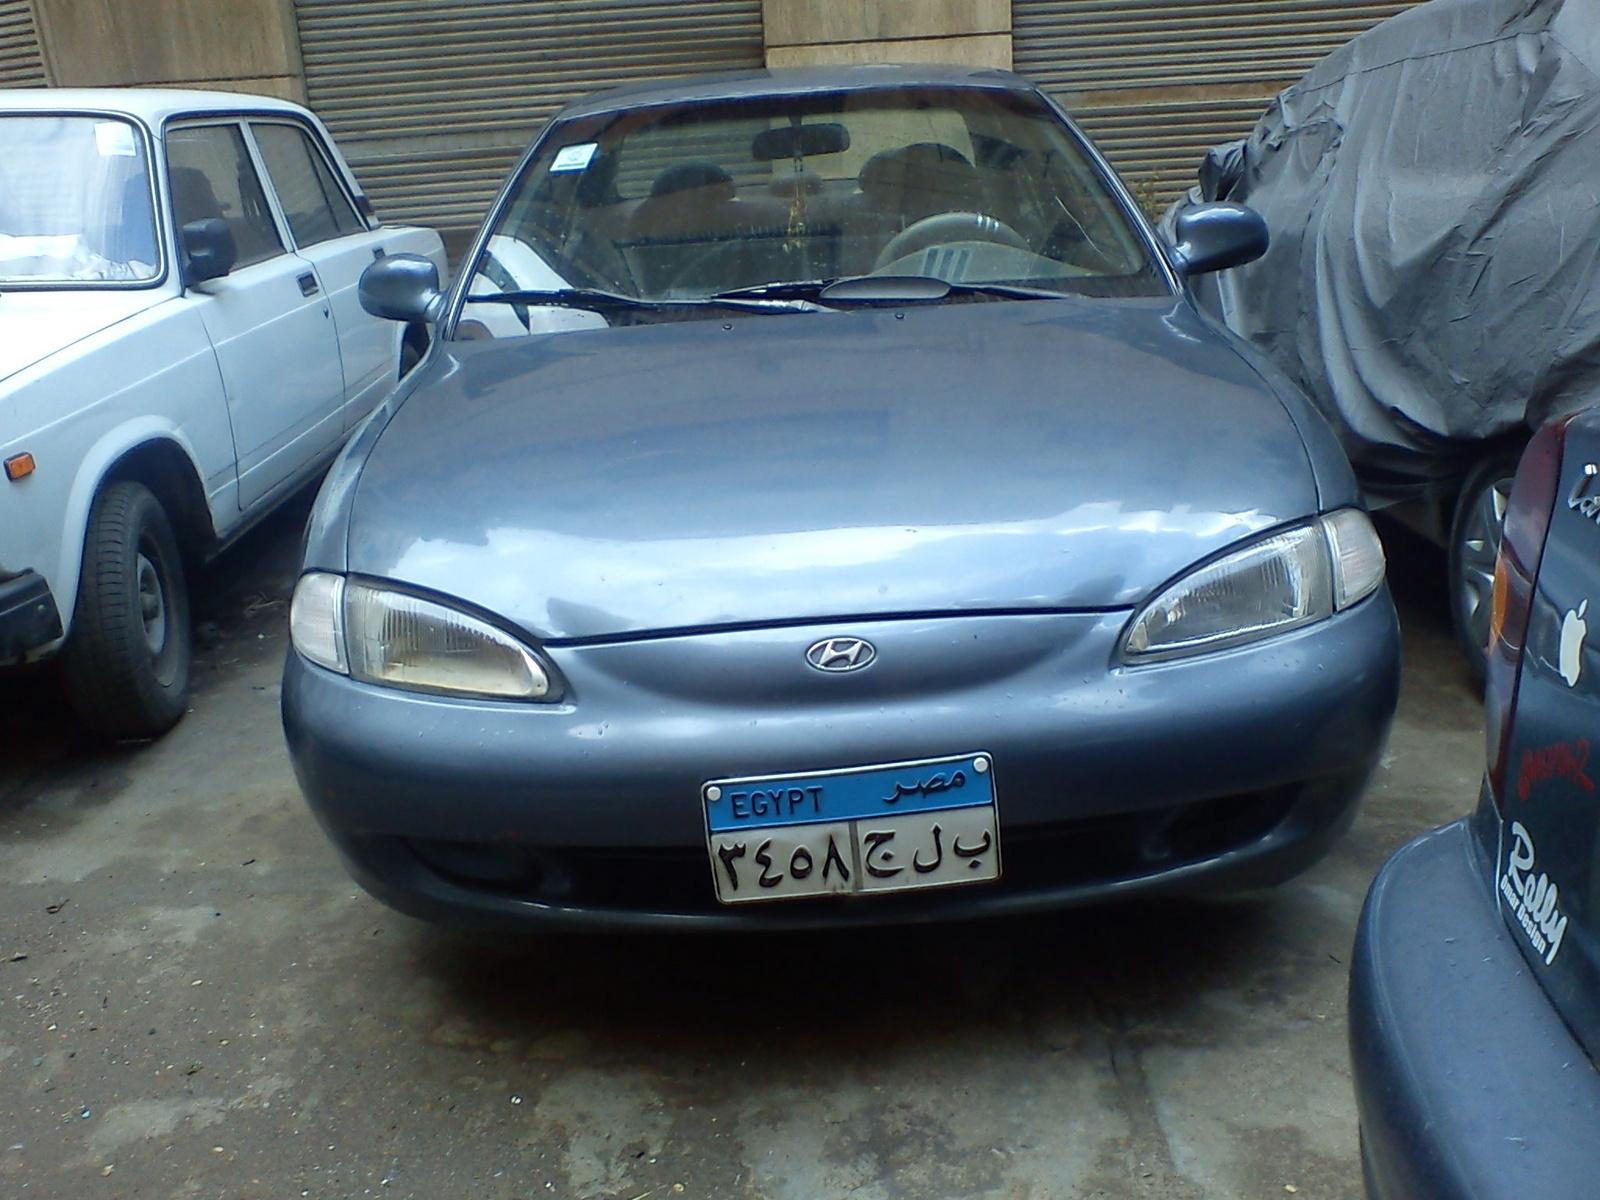 1996 Hyundai Elantra Overview Cargurus